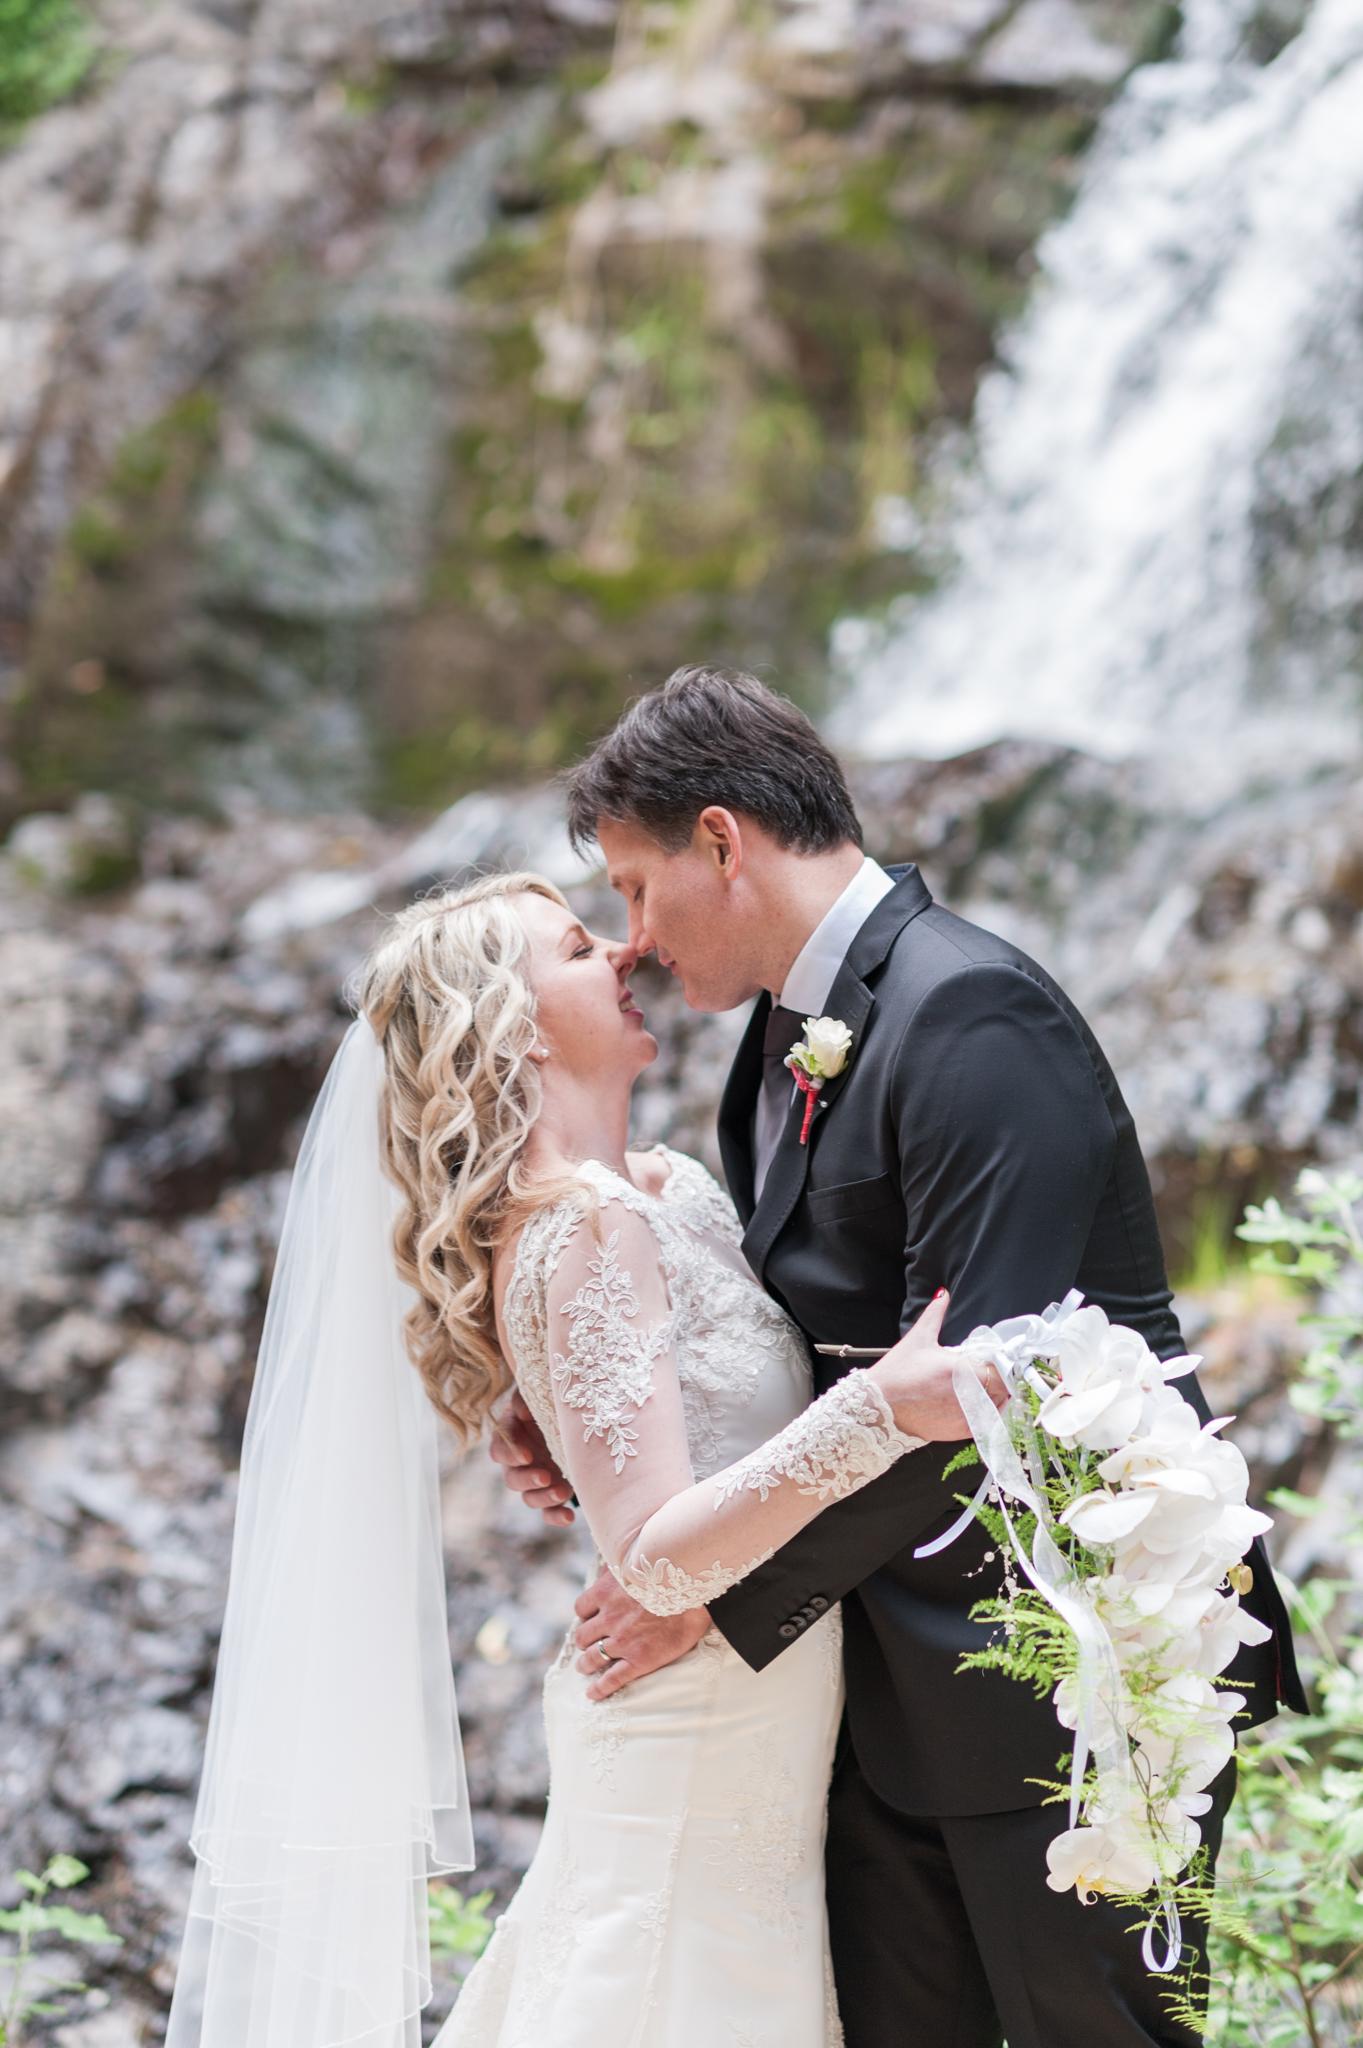 Angelique_Smith_Photography_Pieter&Yvonne_Wedding-334.jpg